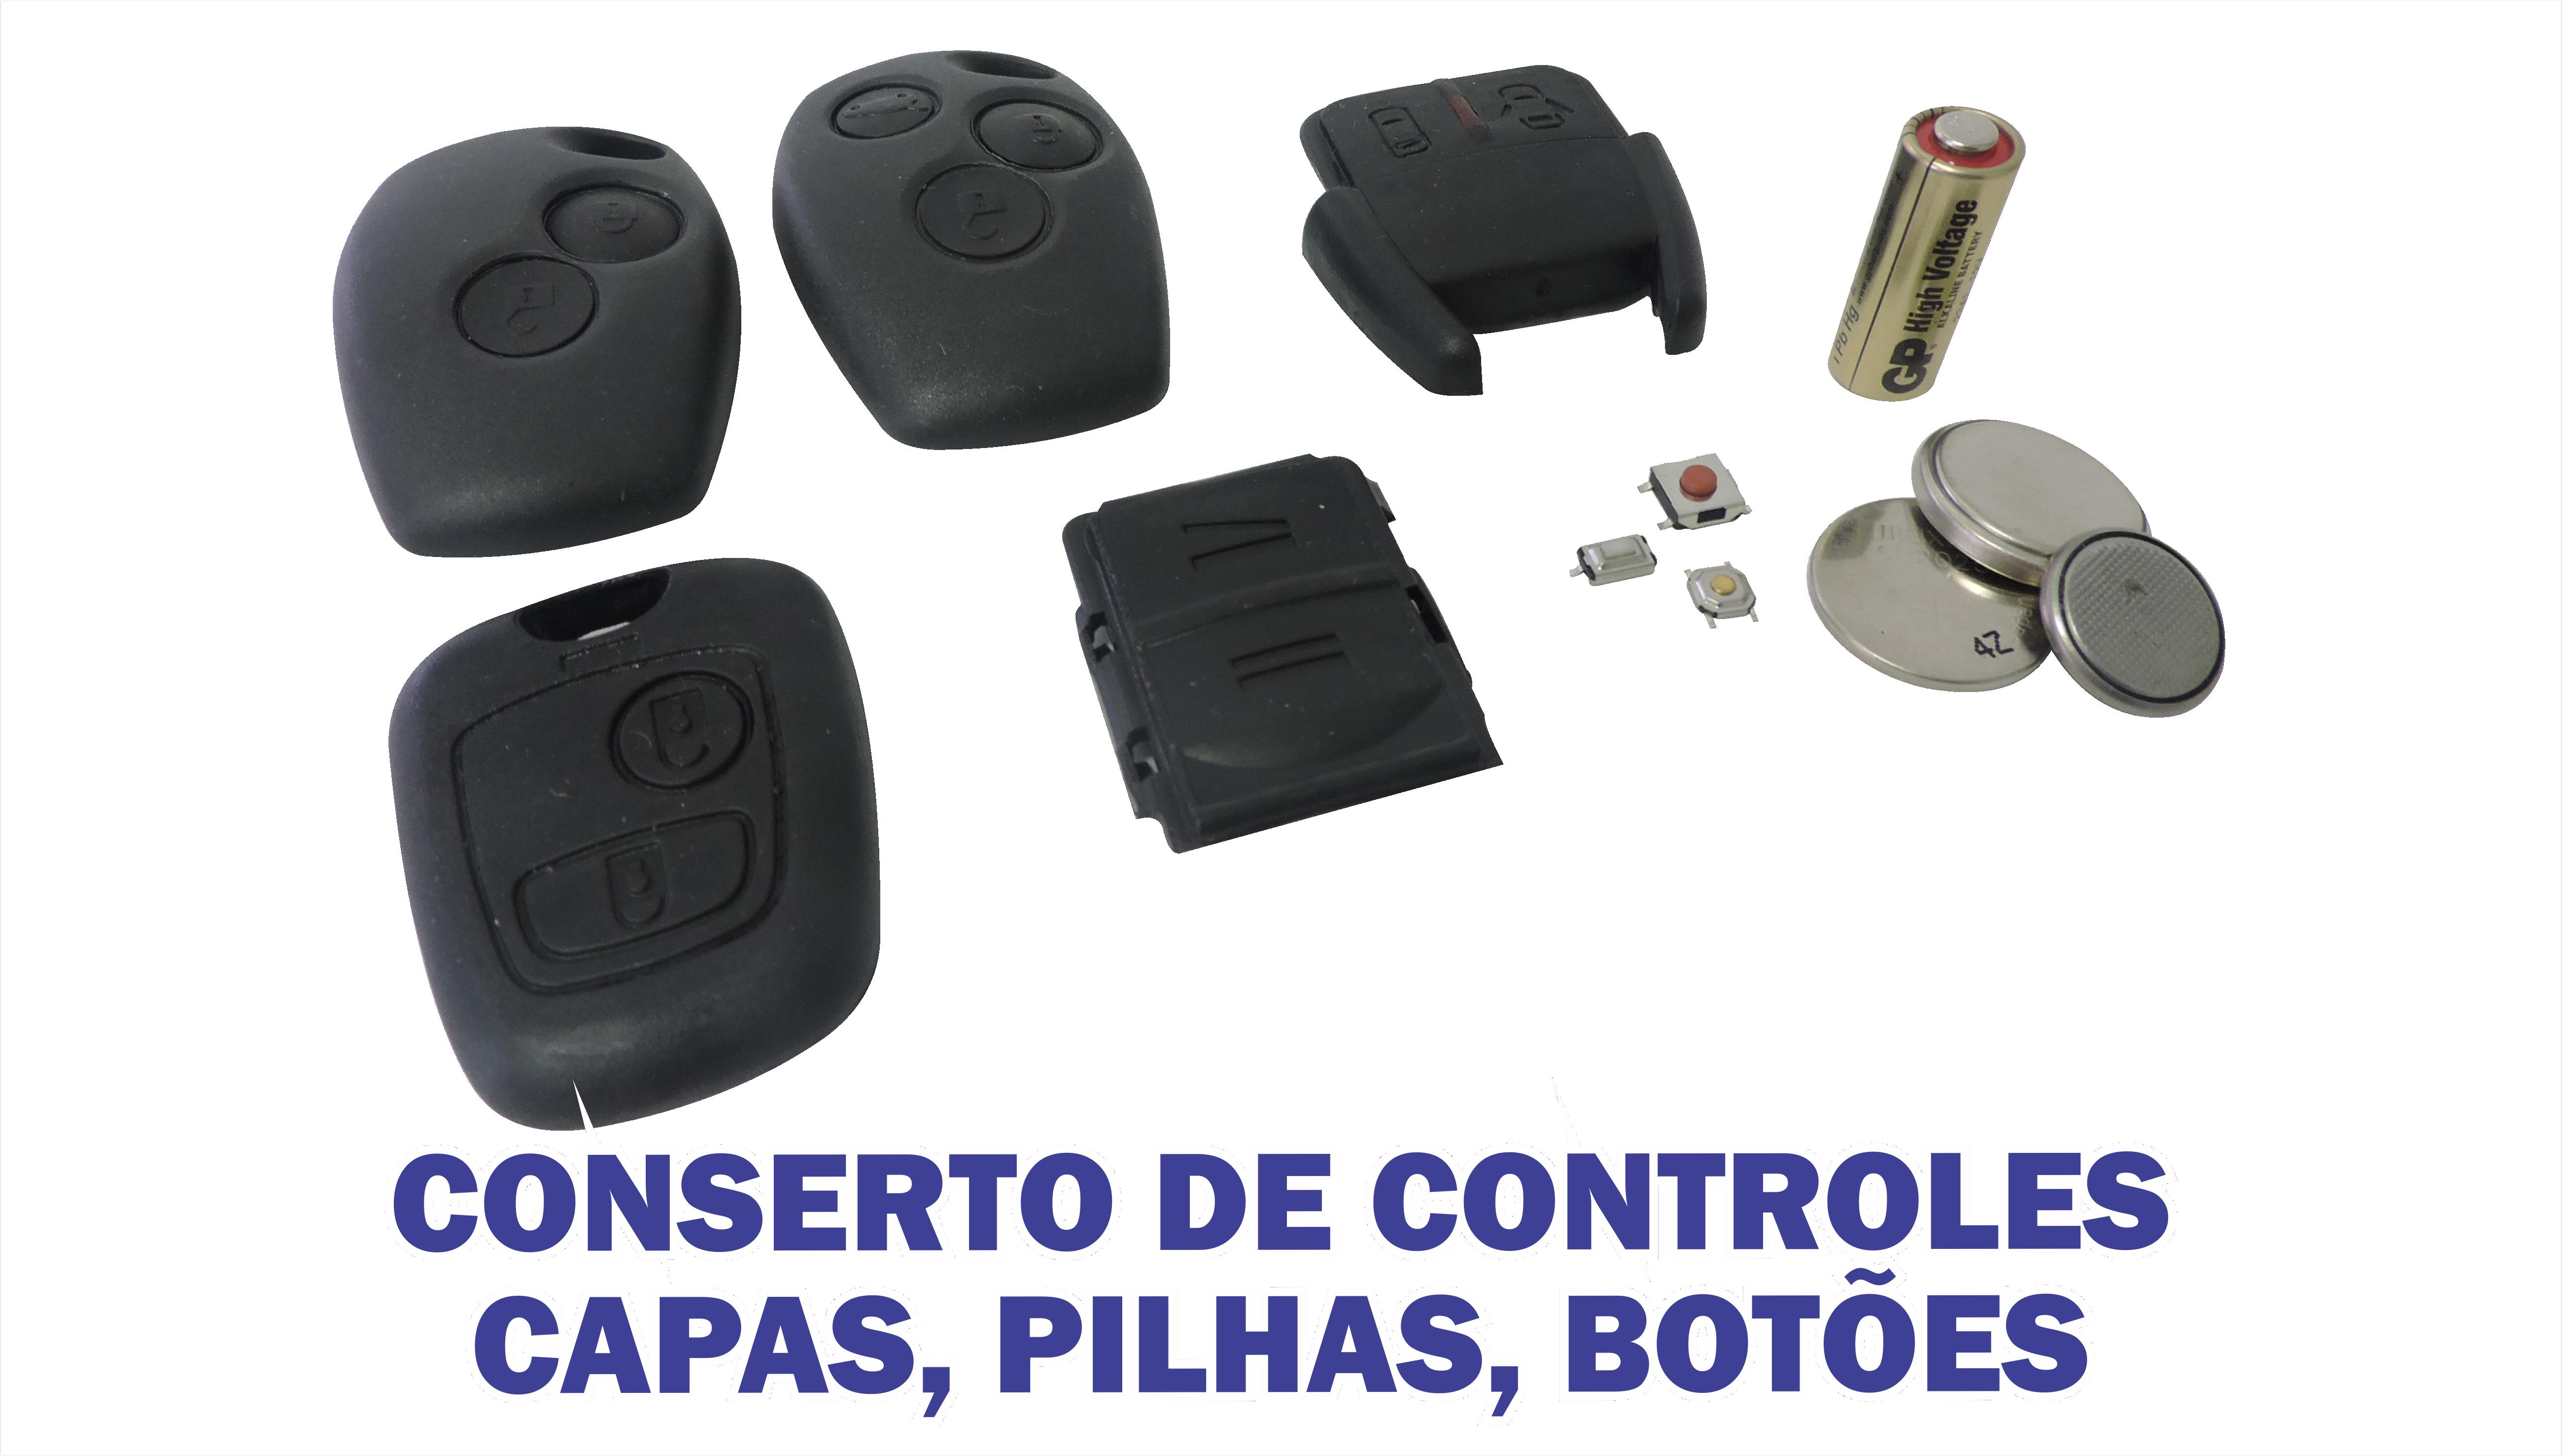 CONSERTO DE CONTROLES CAPAS PILHAS BOTOES